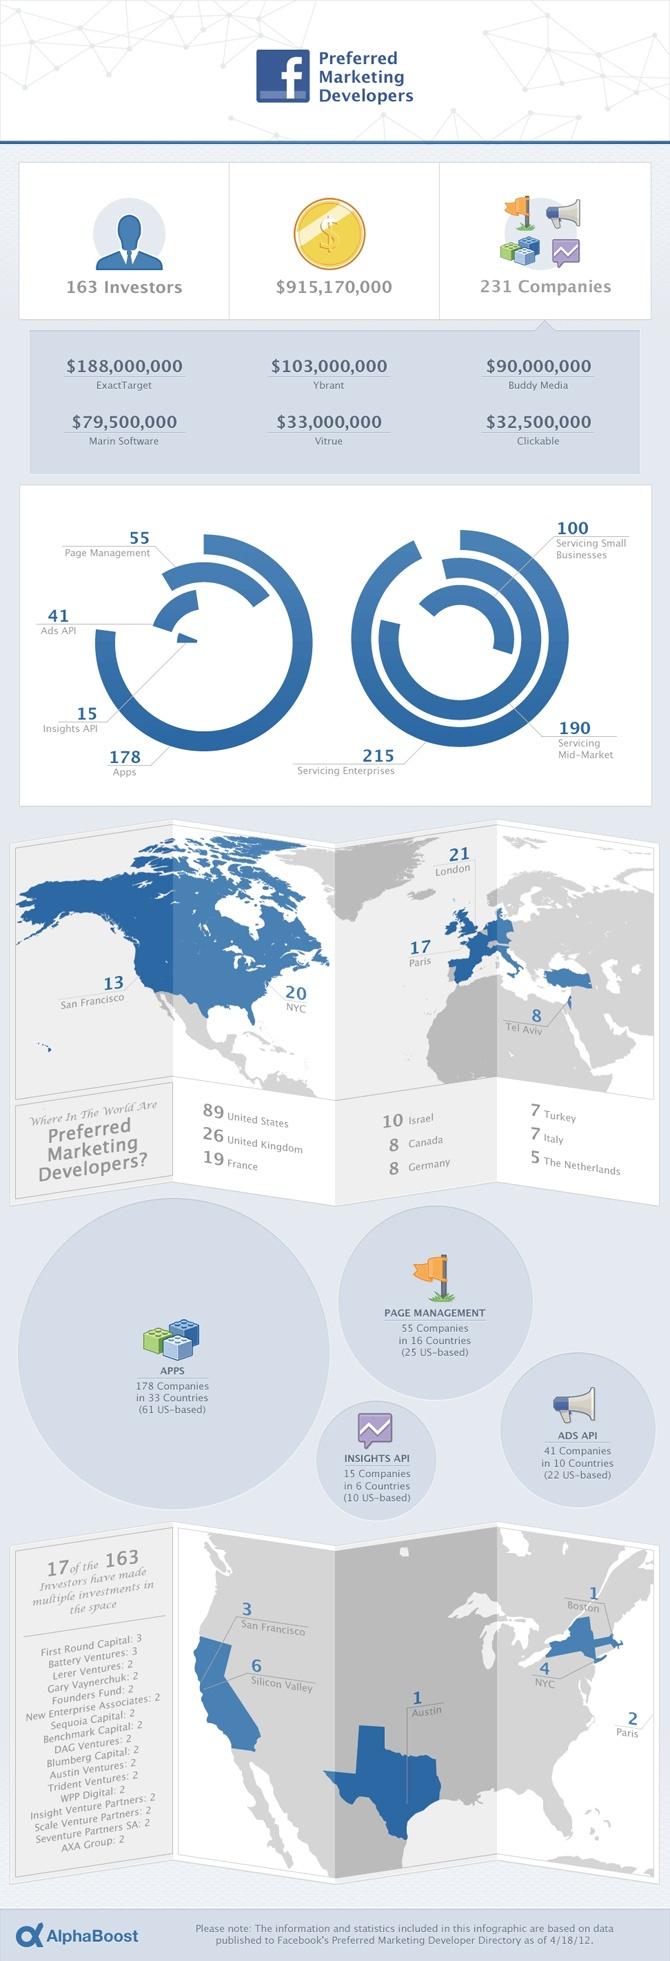 Facebook Preferred Marketing Developers